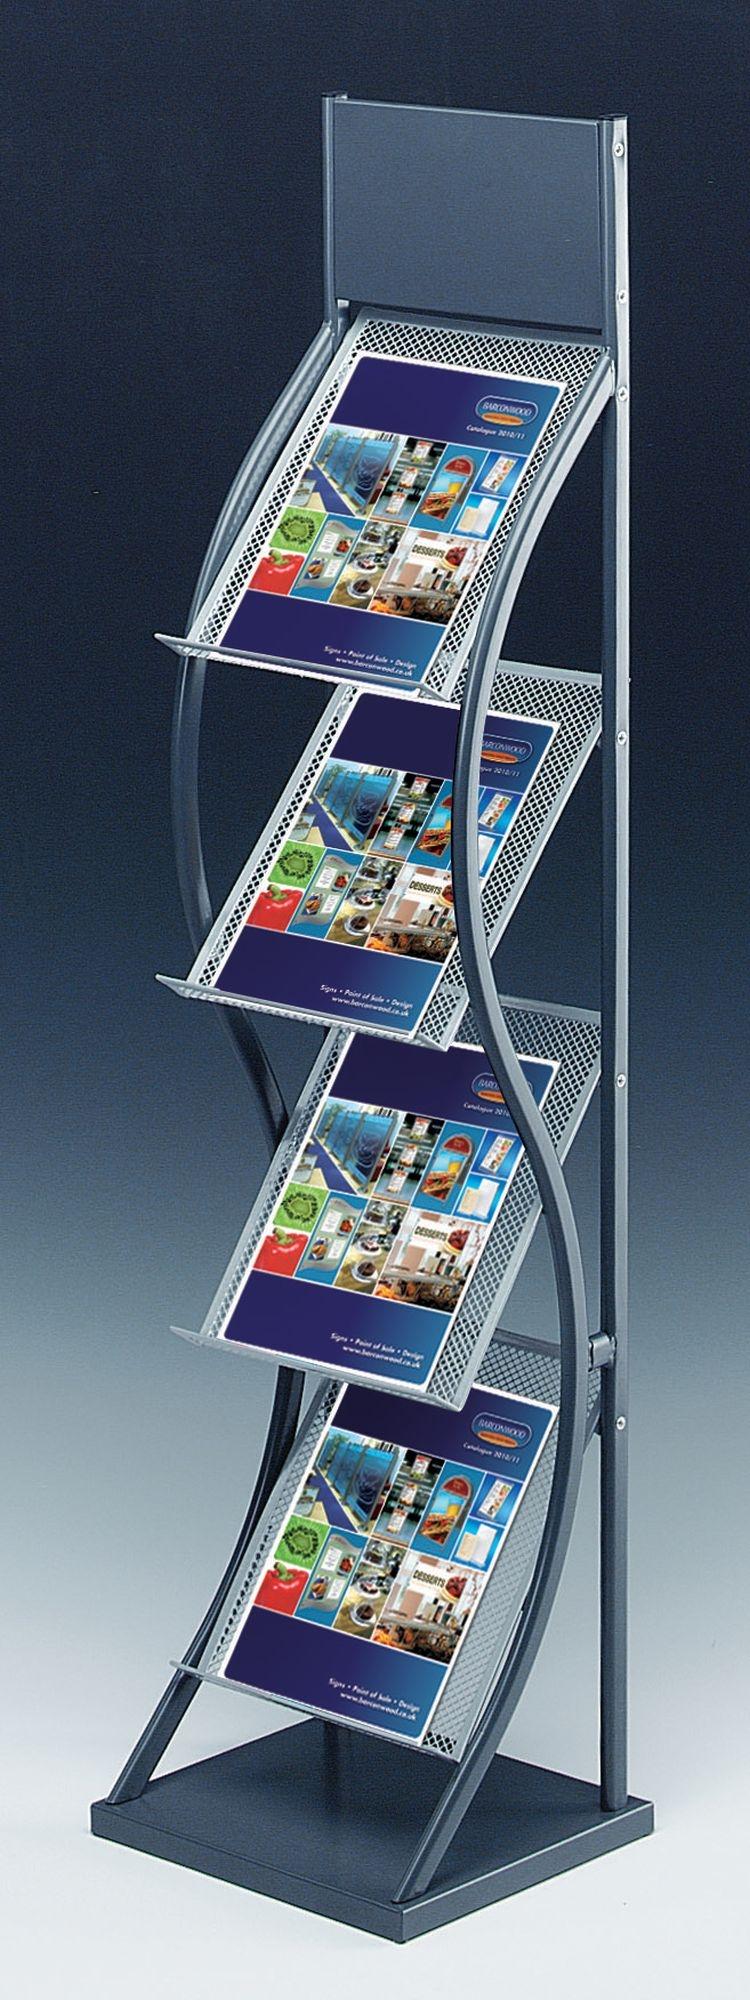 All Metal Brochure Holder Floor Stand Displaysbarconwood